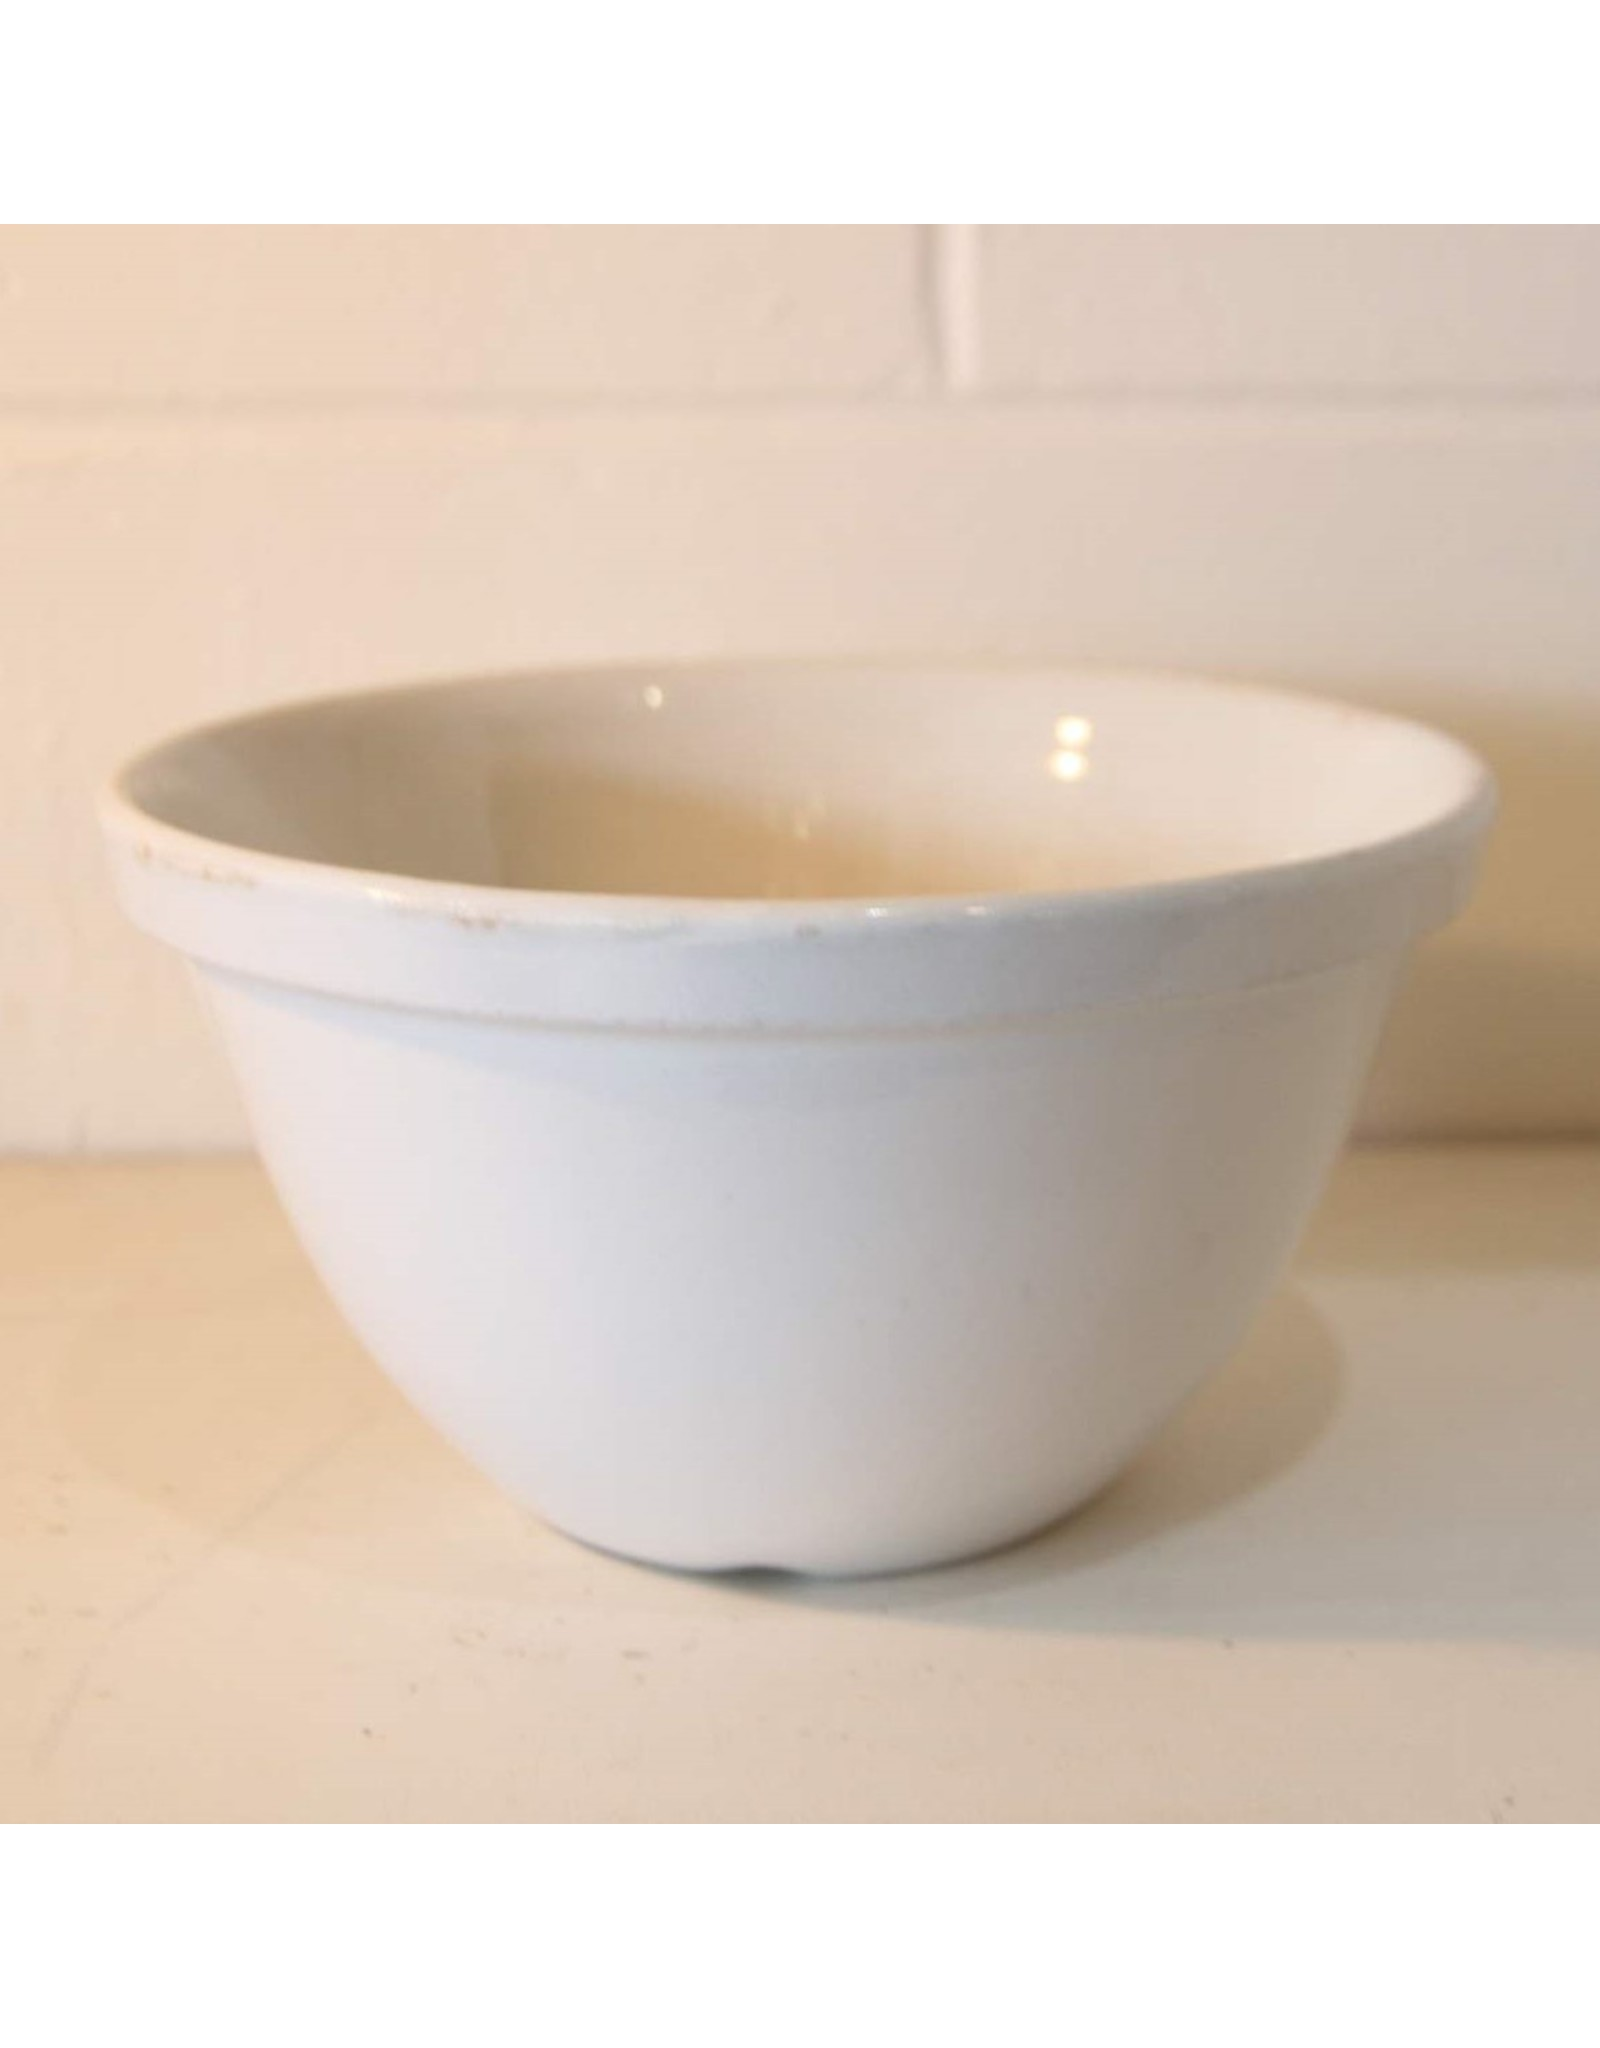 Mixing bowl - ironstone, W Adams & Sons, England